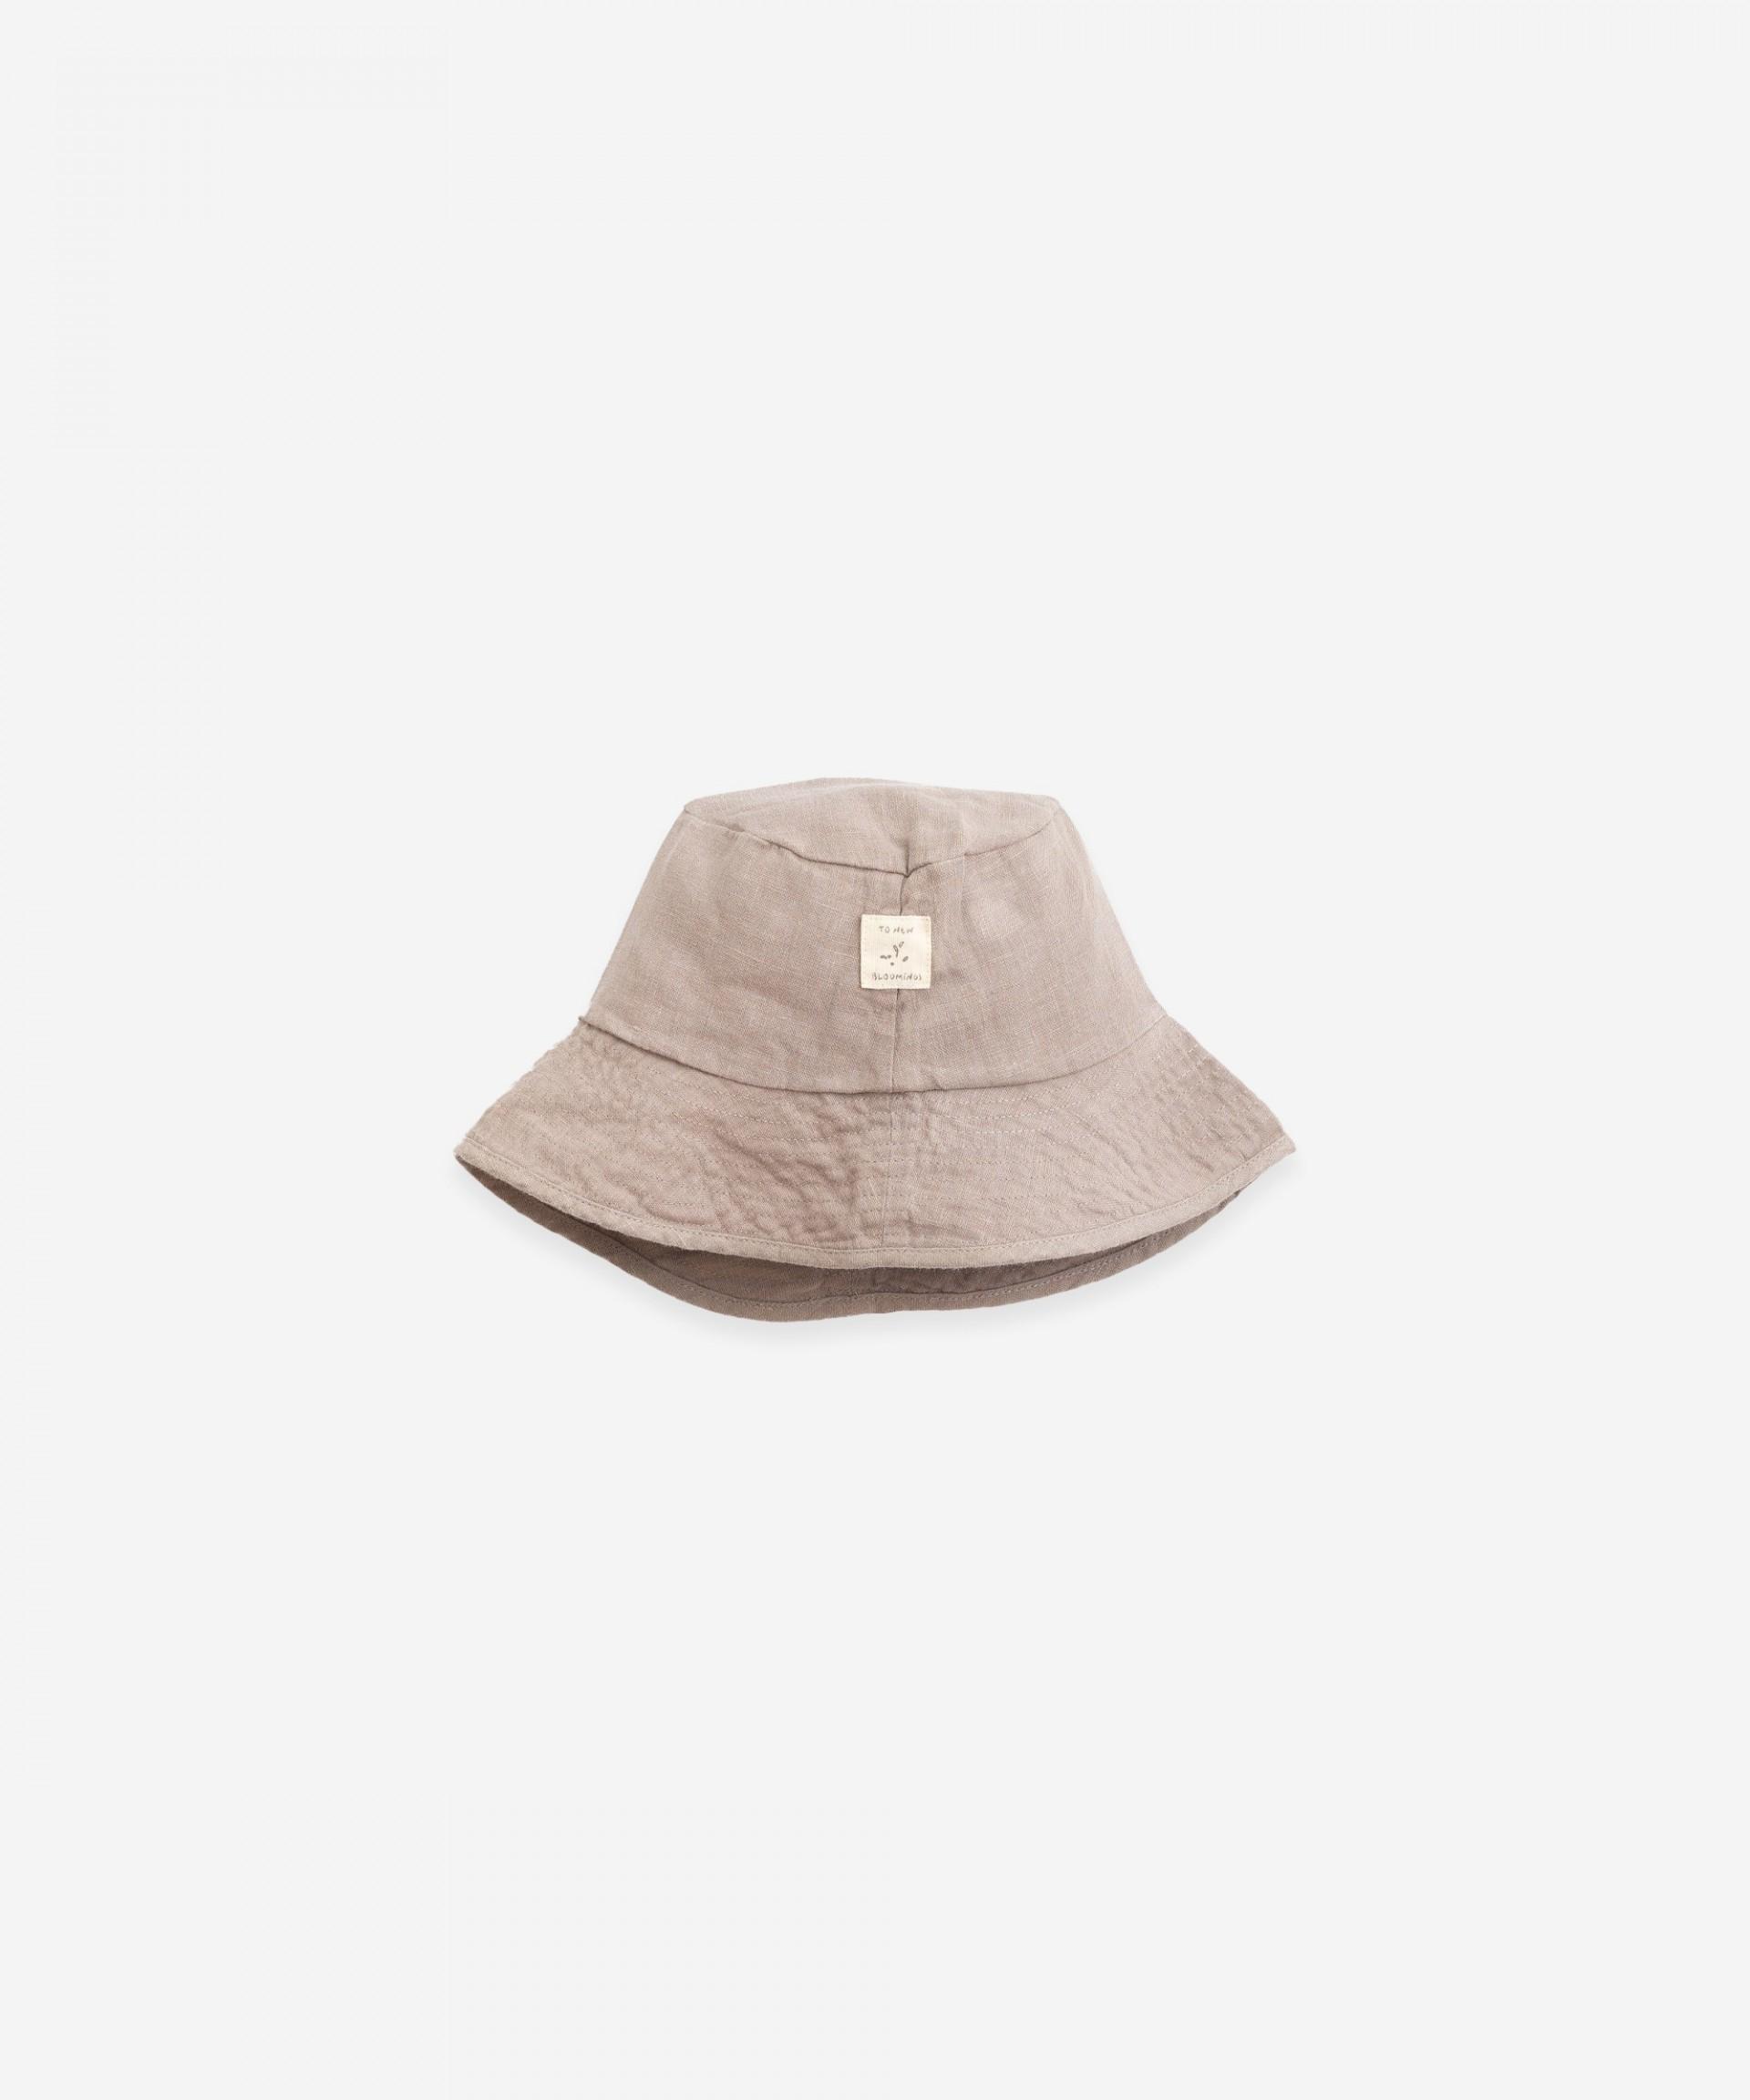 Sombrero con etiqueta de lino | Botany